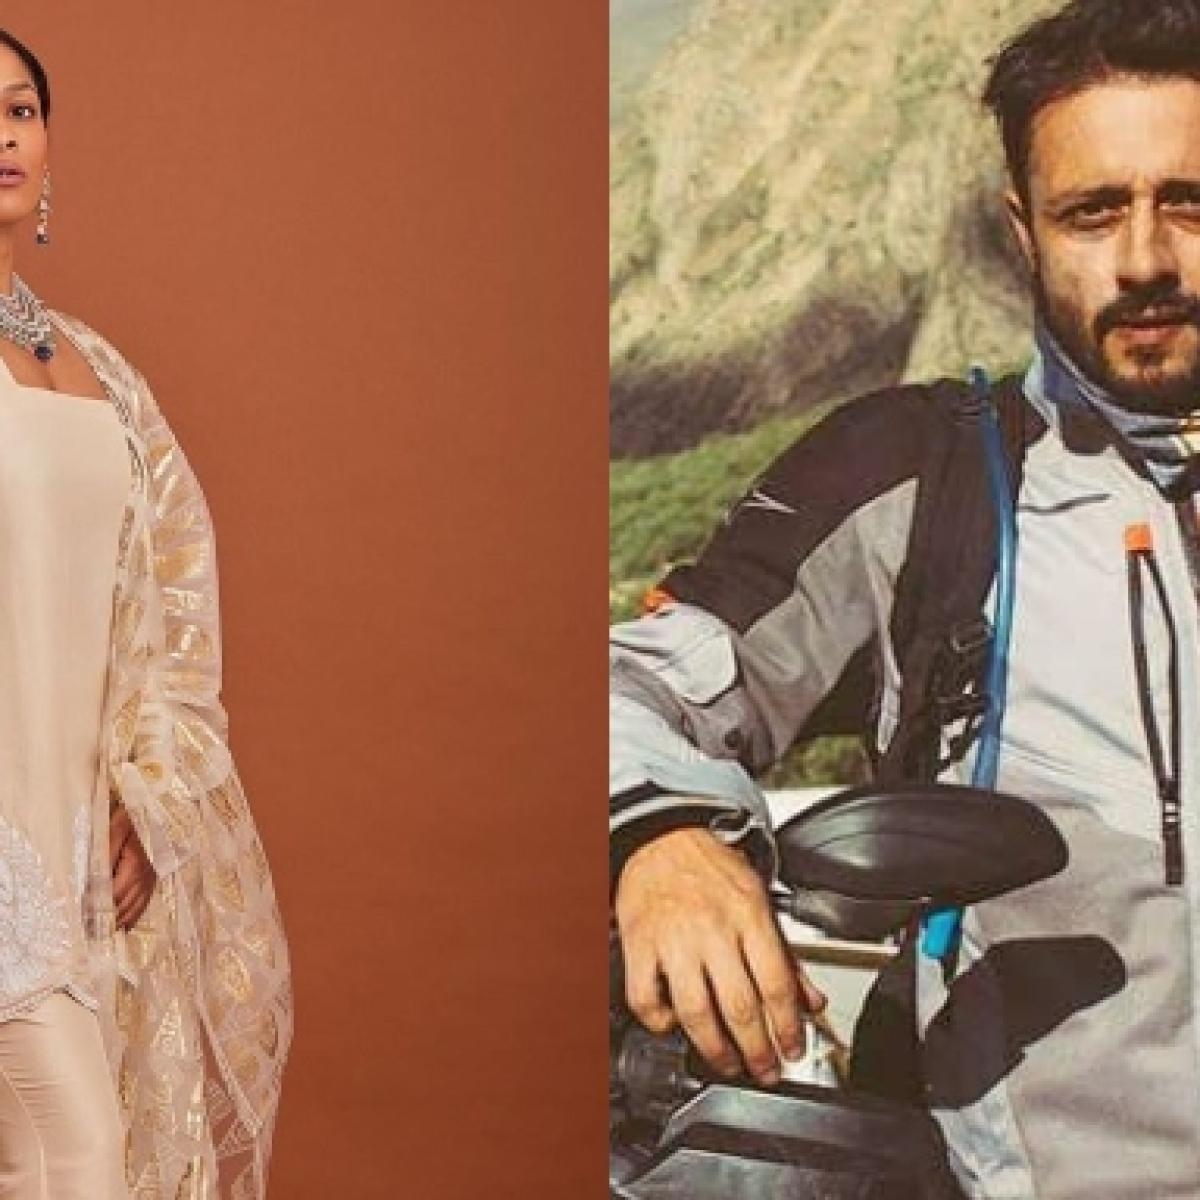 Did Satyadeep Misra make relationship with Masaba Gupta Instagram official?